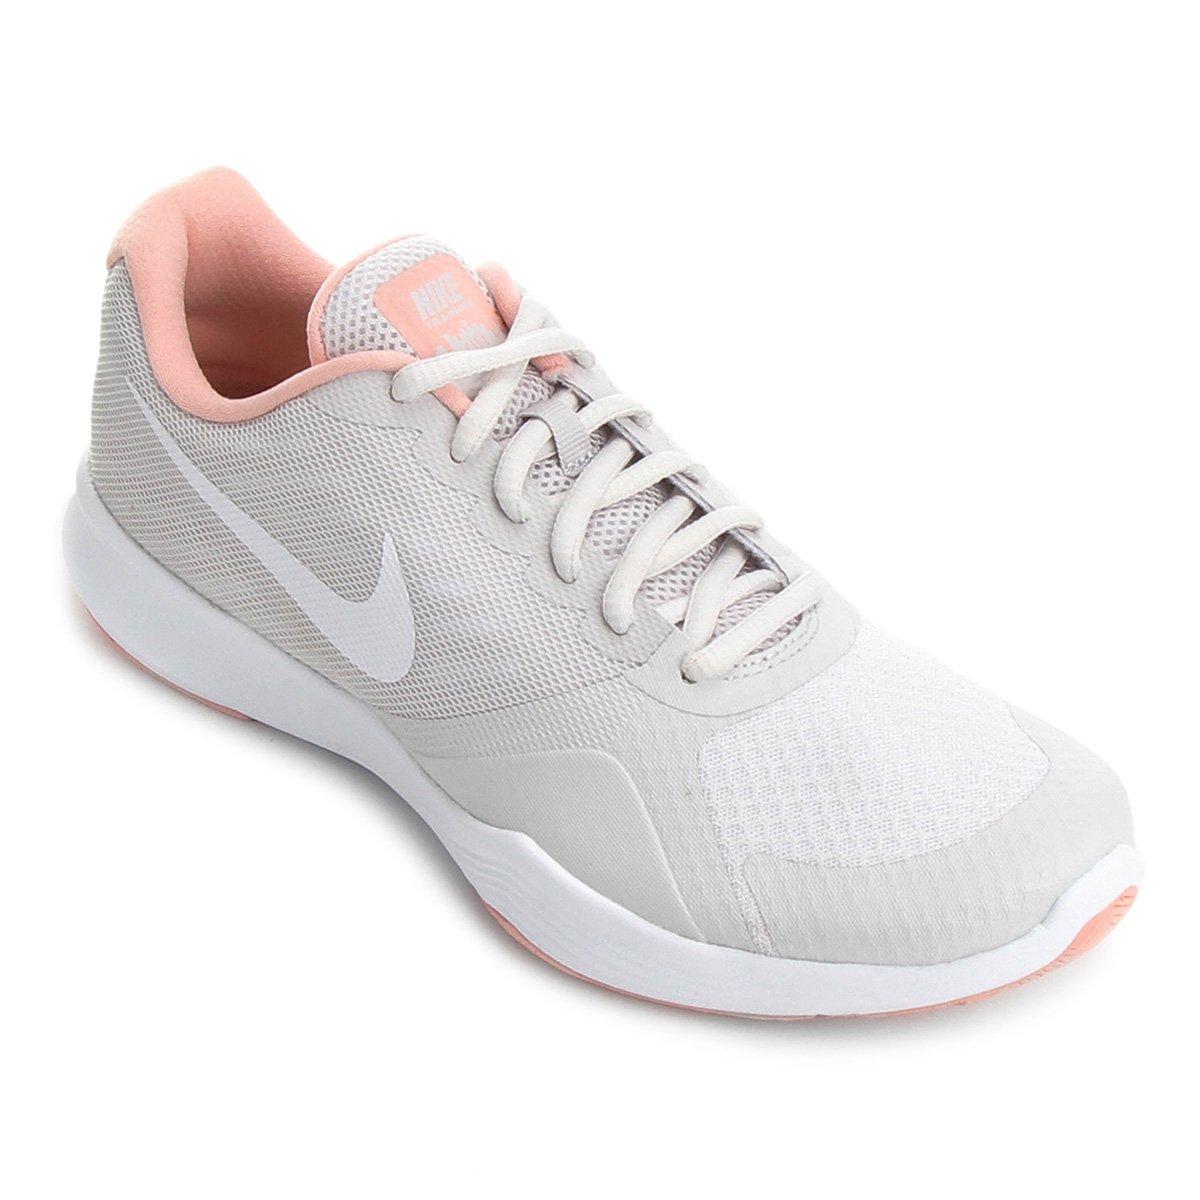 Nike Tênis Tênis e Nike Trainer Feminino Cinza Branco City pZnEUqw